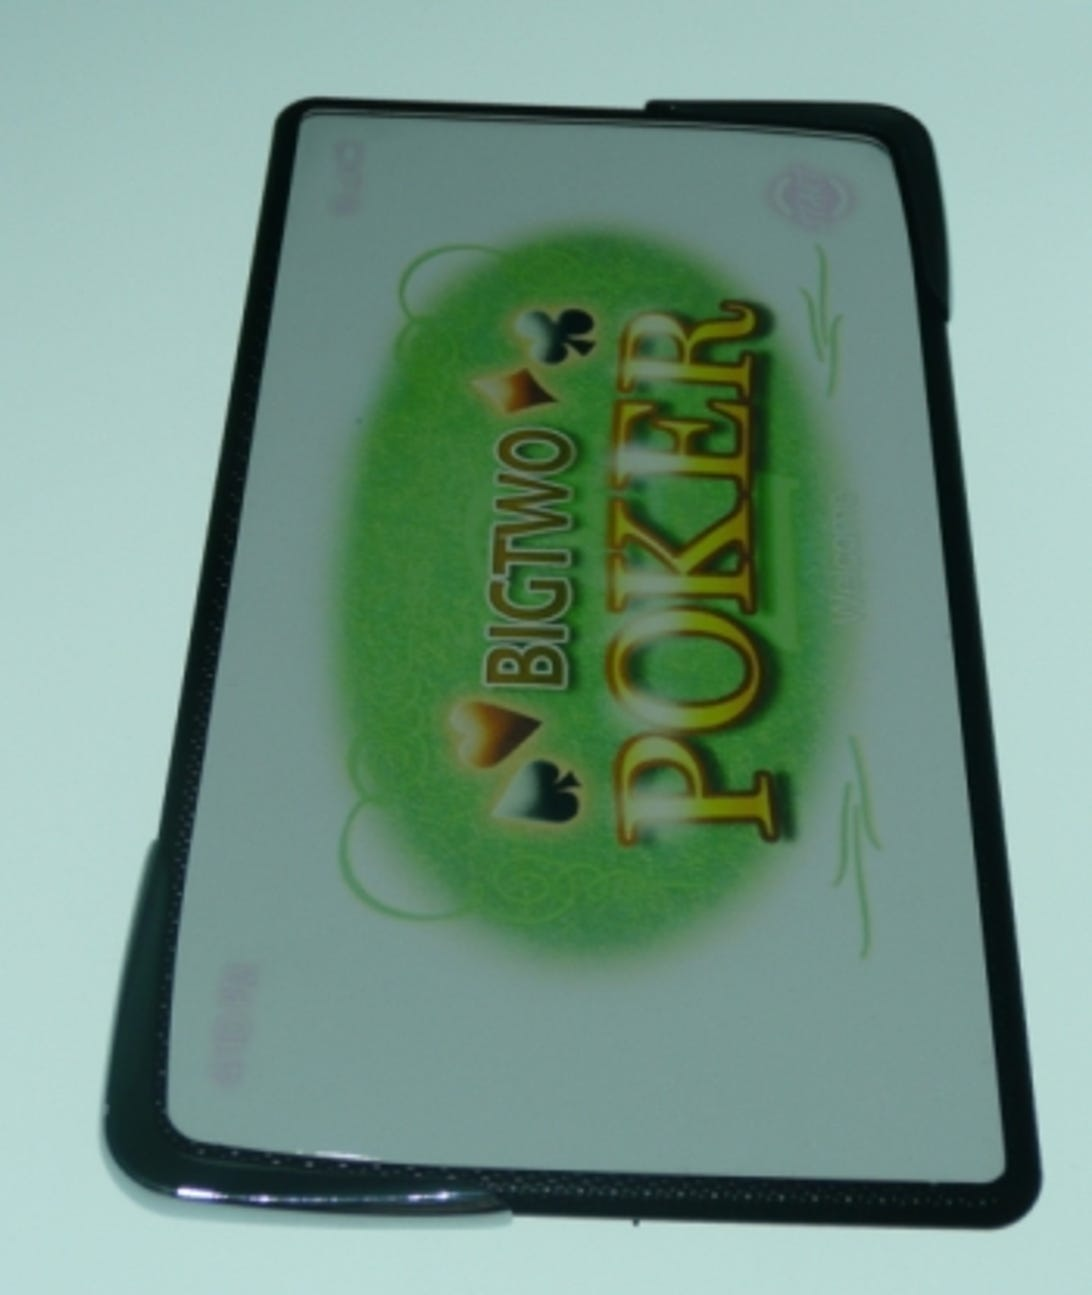 40154154-6-iris-asus-bingo-350.jpg